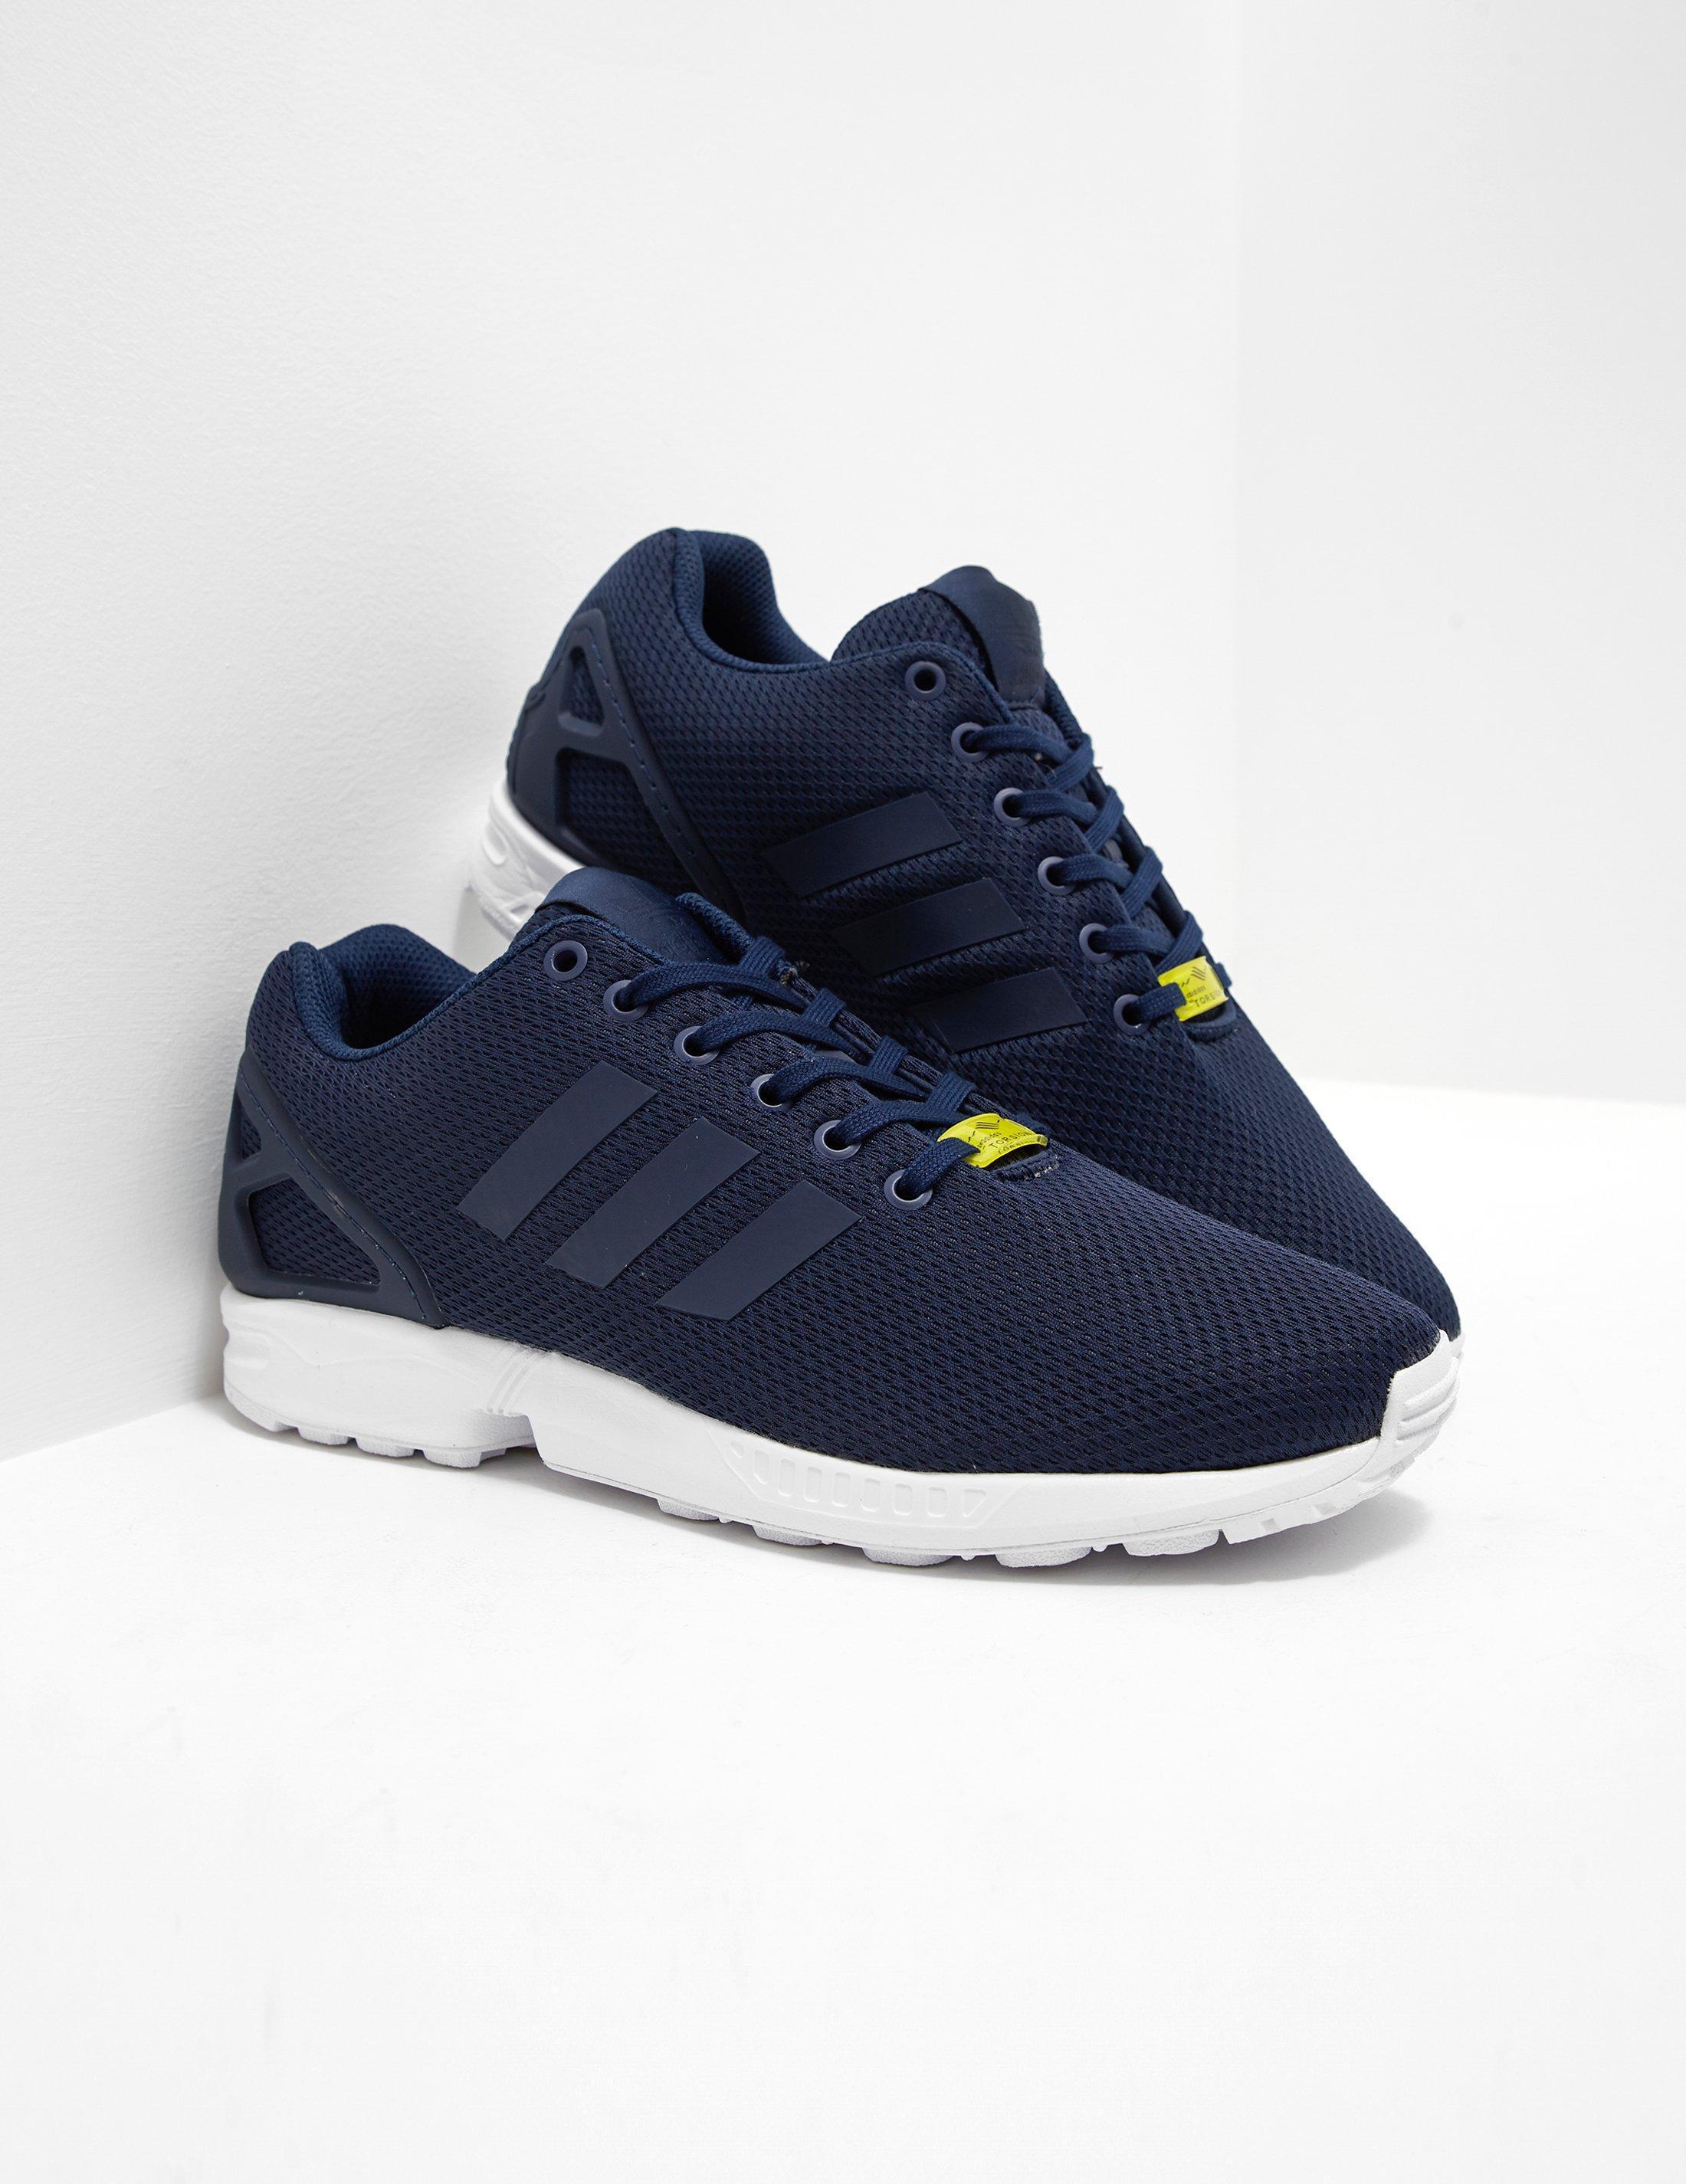 lyst adidas originali mens zx flusso blu navy in blu per gli uomini.